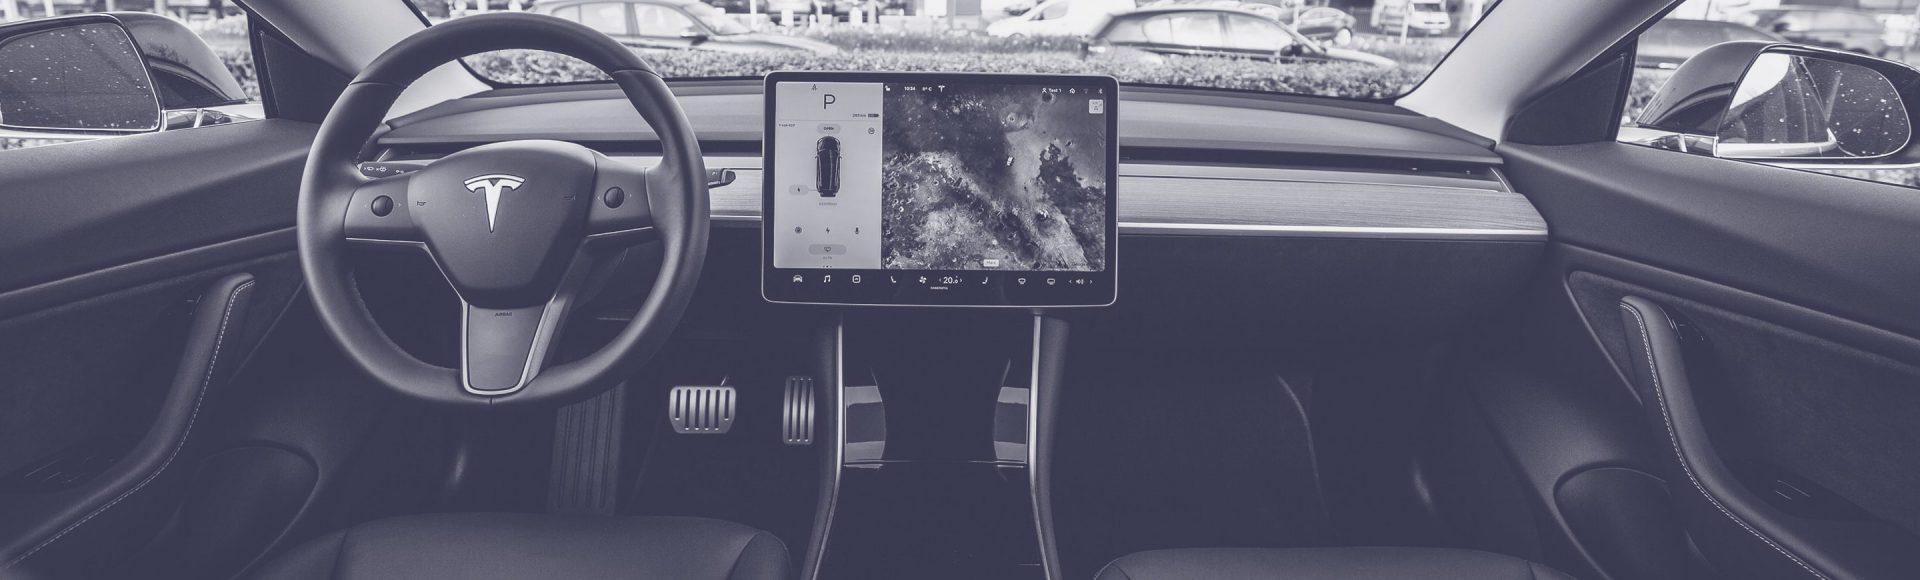 ARK-Invest_Blog-Banner_2015_10_27---Tesla-Battery